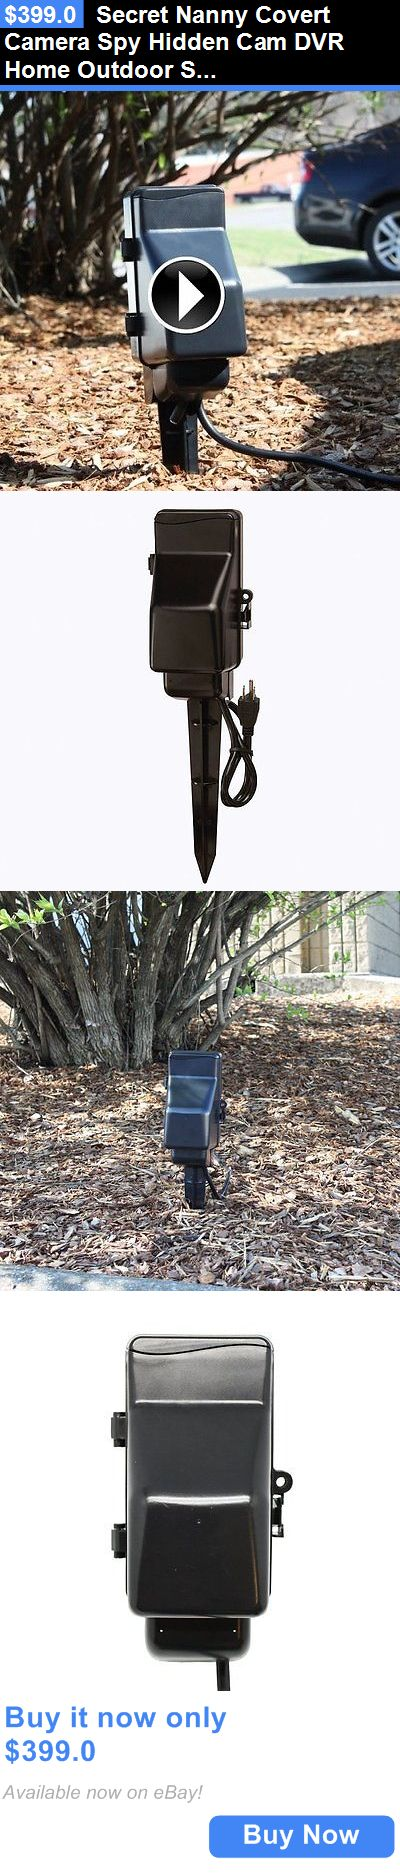 Surveillance Gadgets: Secret Nanny Covert Camera Spy Hidden Cam Dvr Home Outdoor Surveillance Camera BUY IT NOW ONLY: $399.0